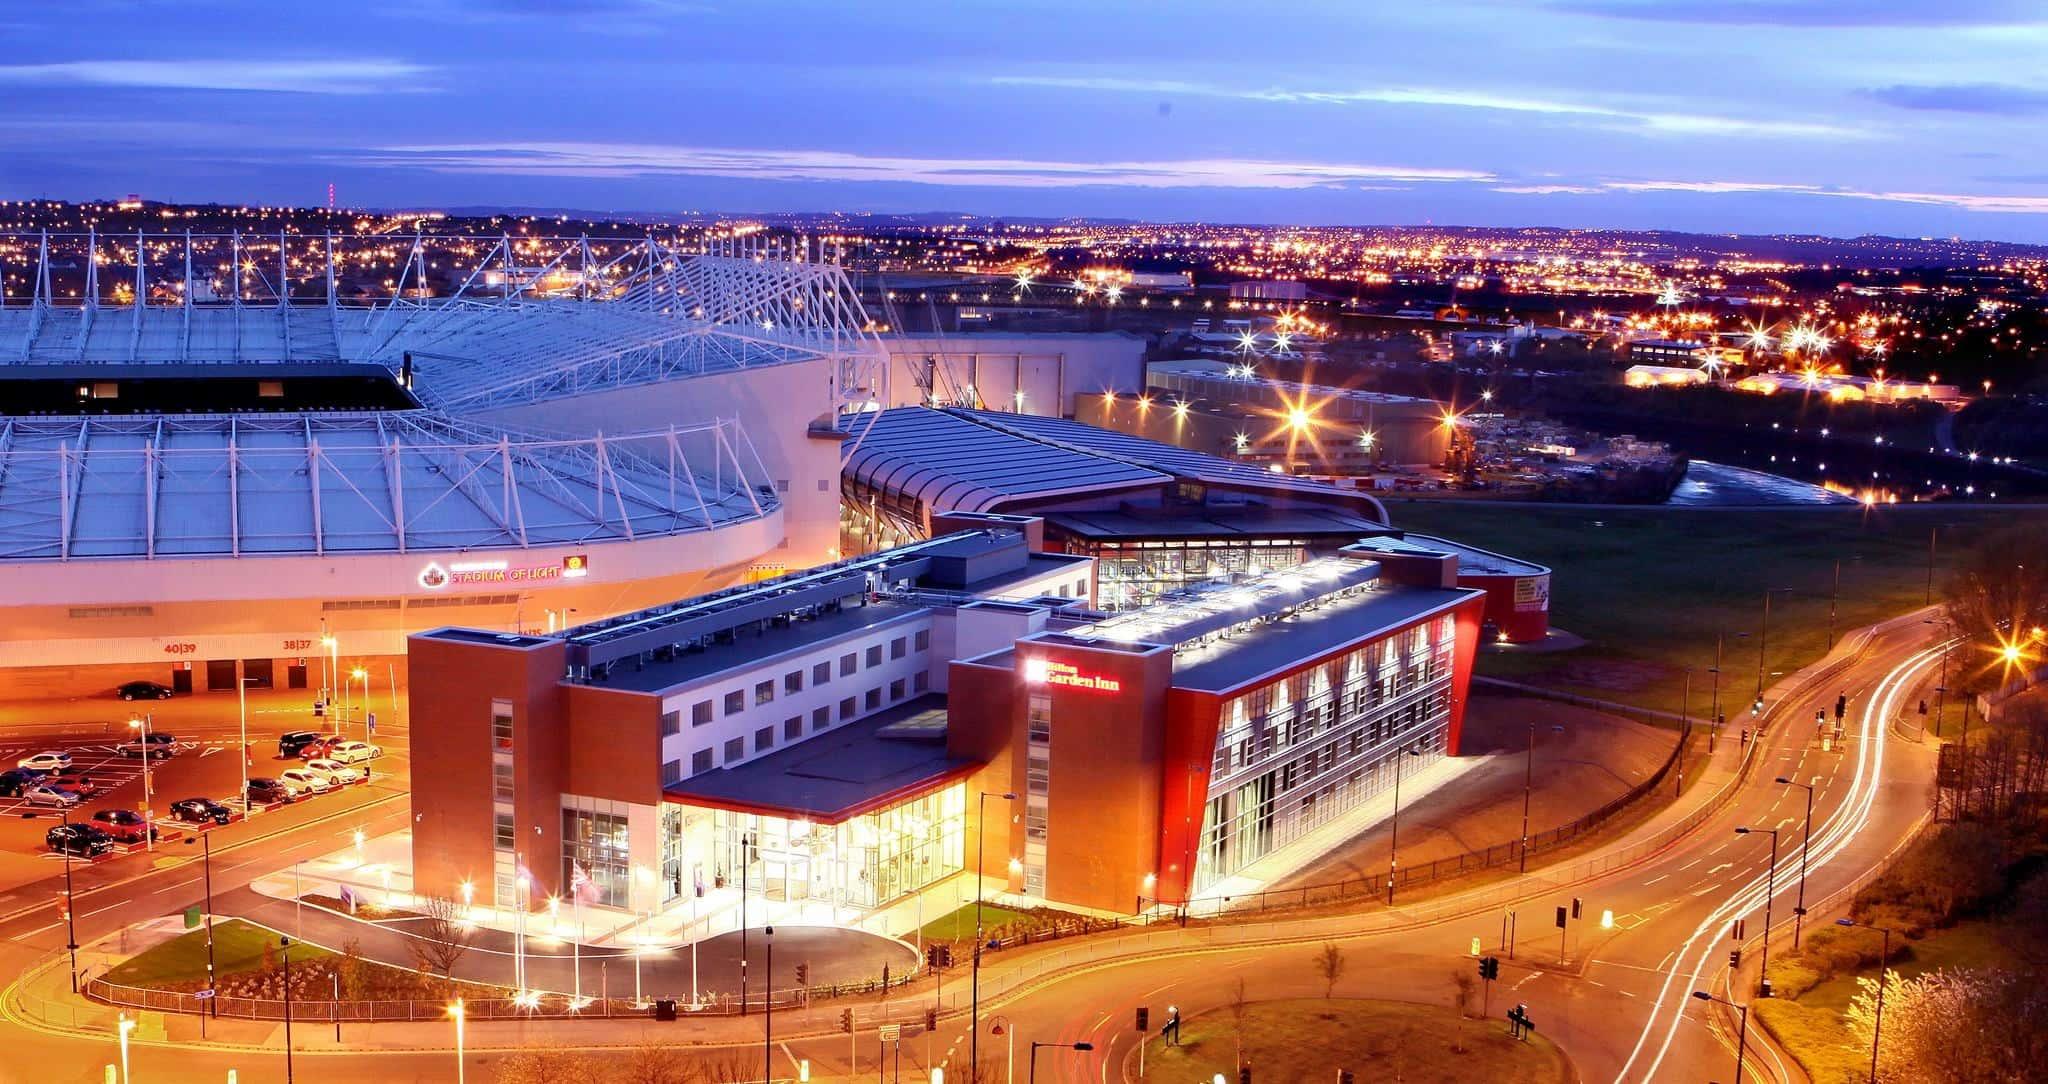 Sunderland's Hilton Garden Inn Hotel next to the Stadium of Light